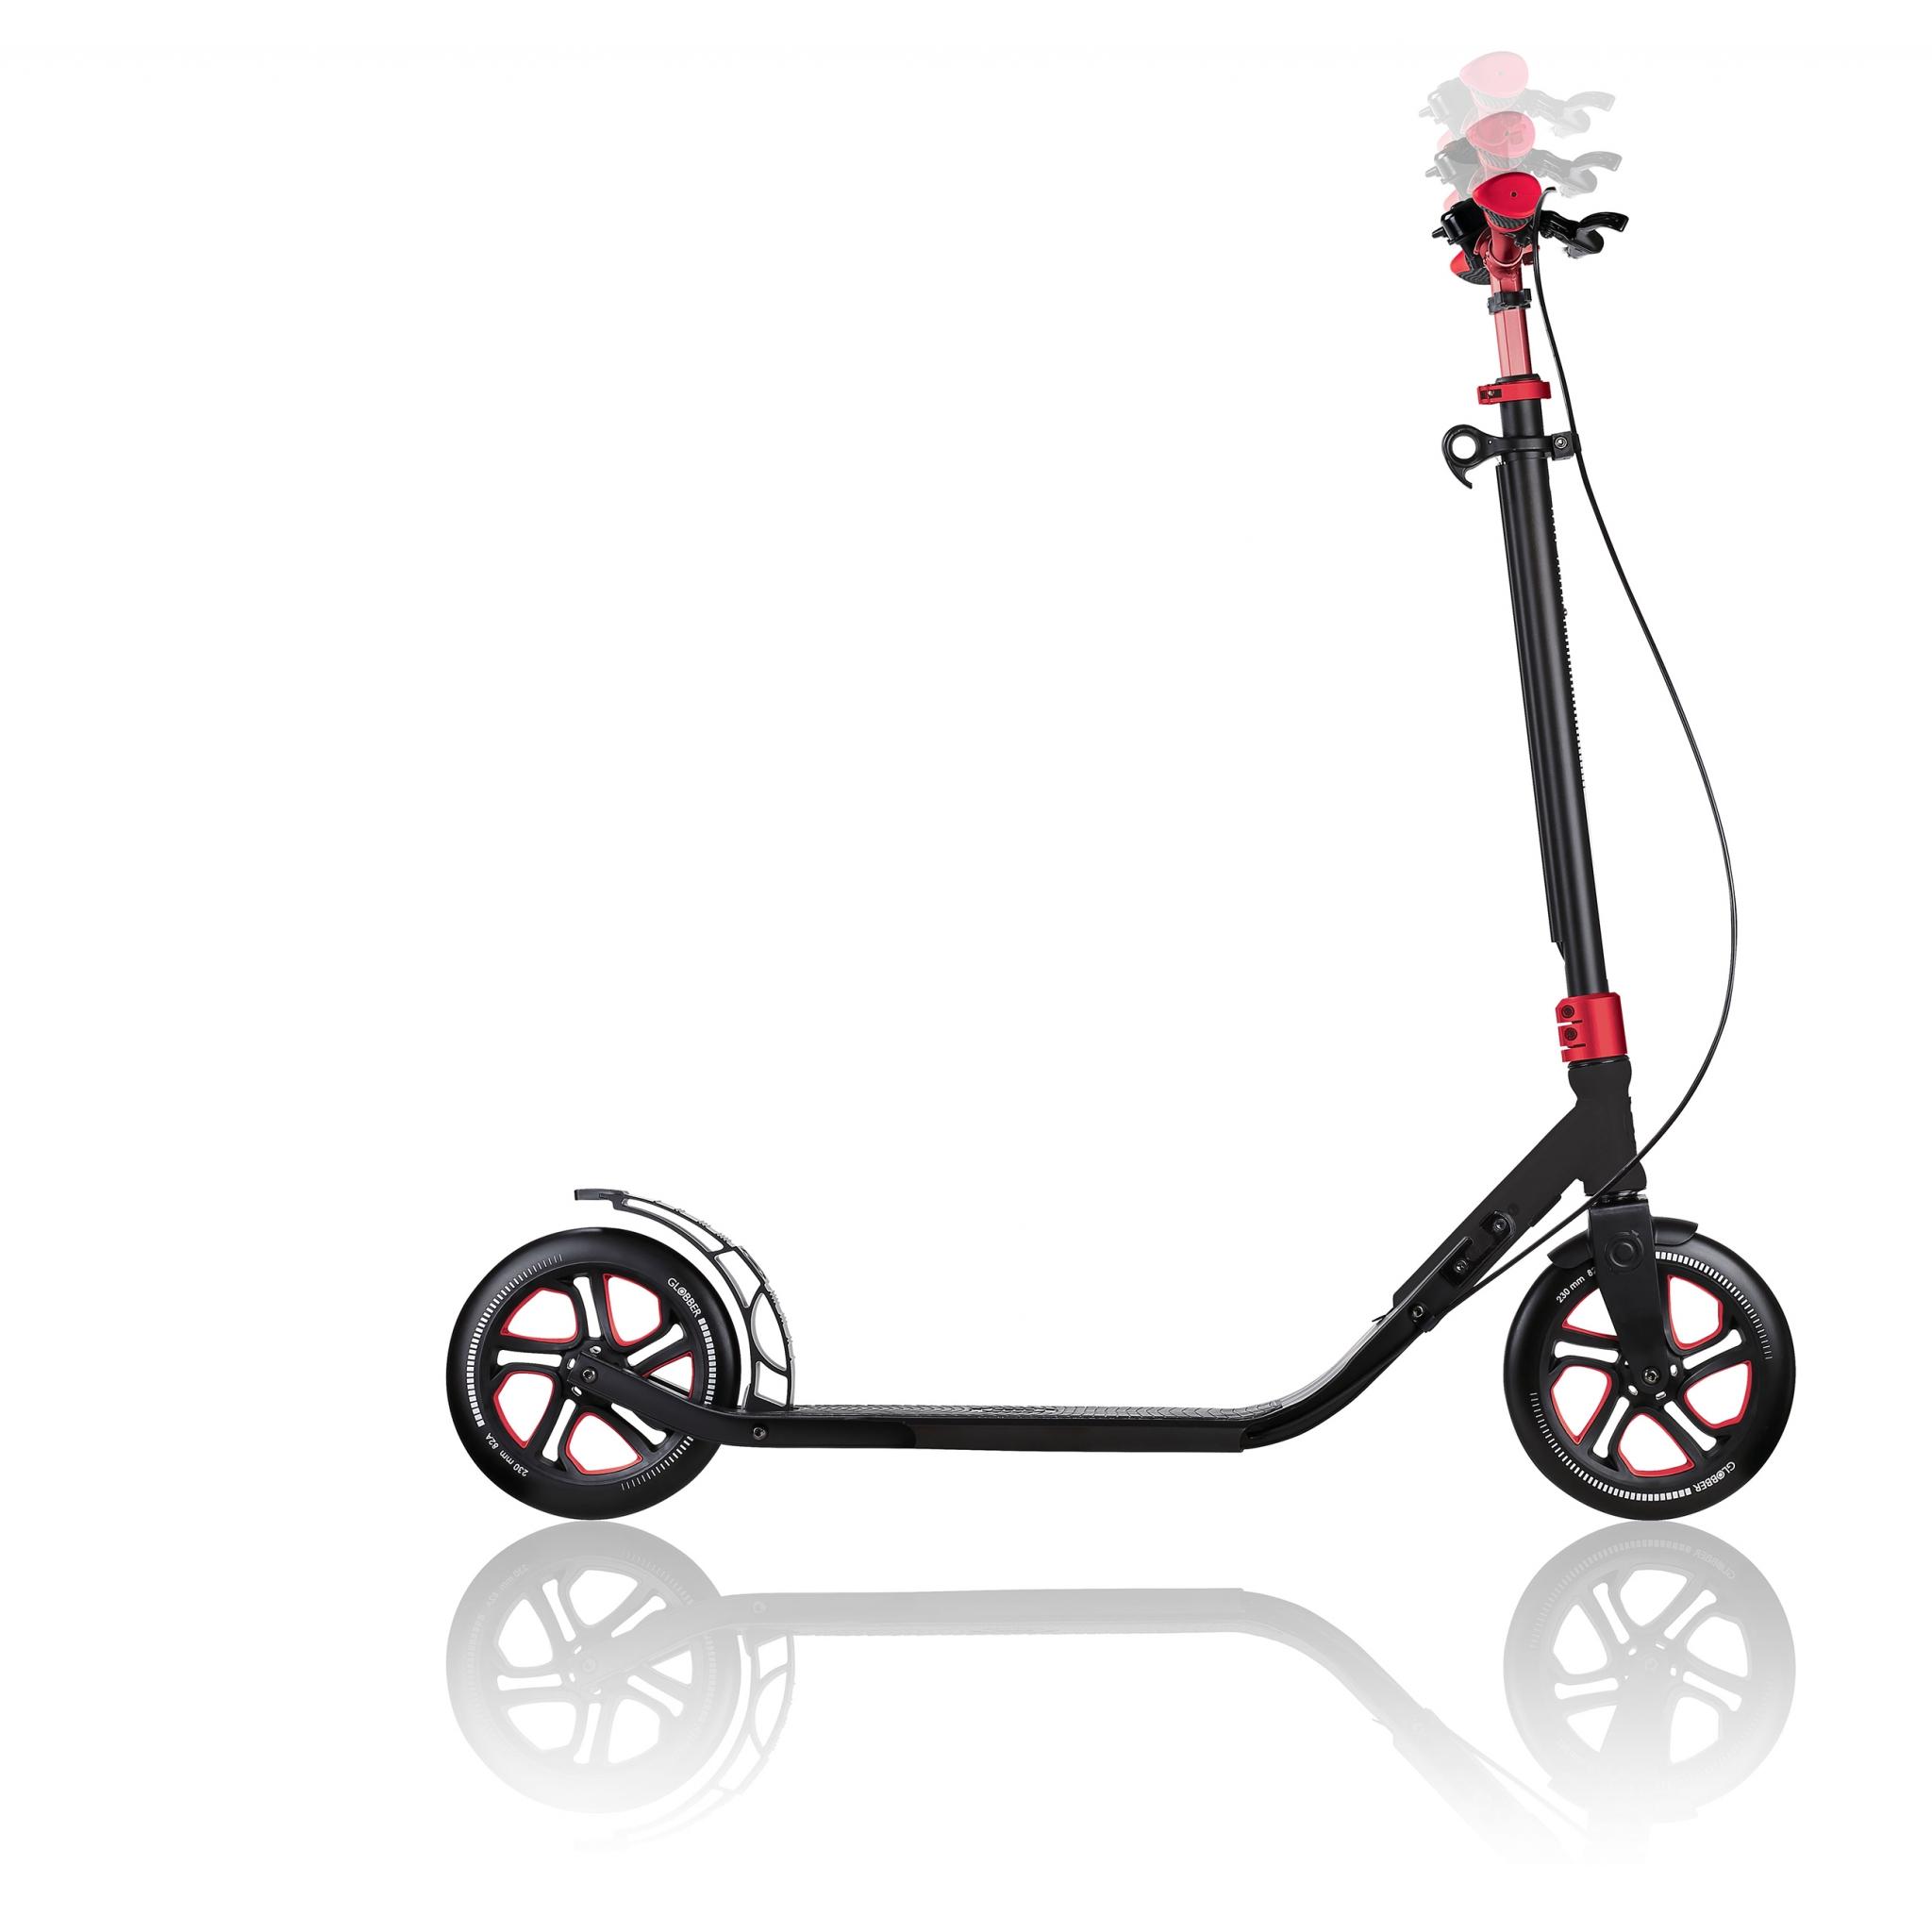 big wheel kick scooter - Globber ONE NL 230 ULTIMATE 4